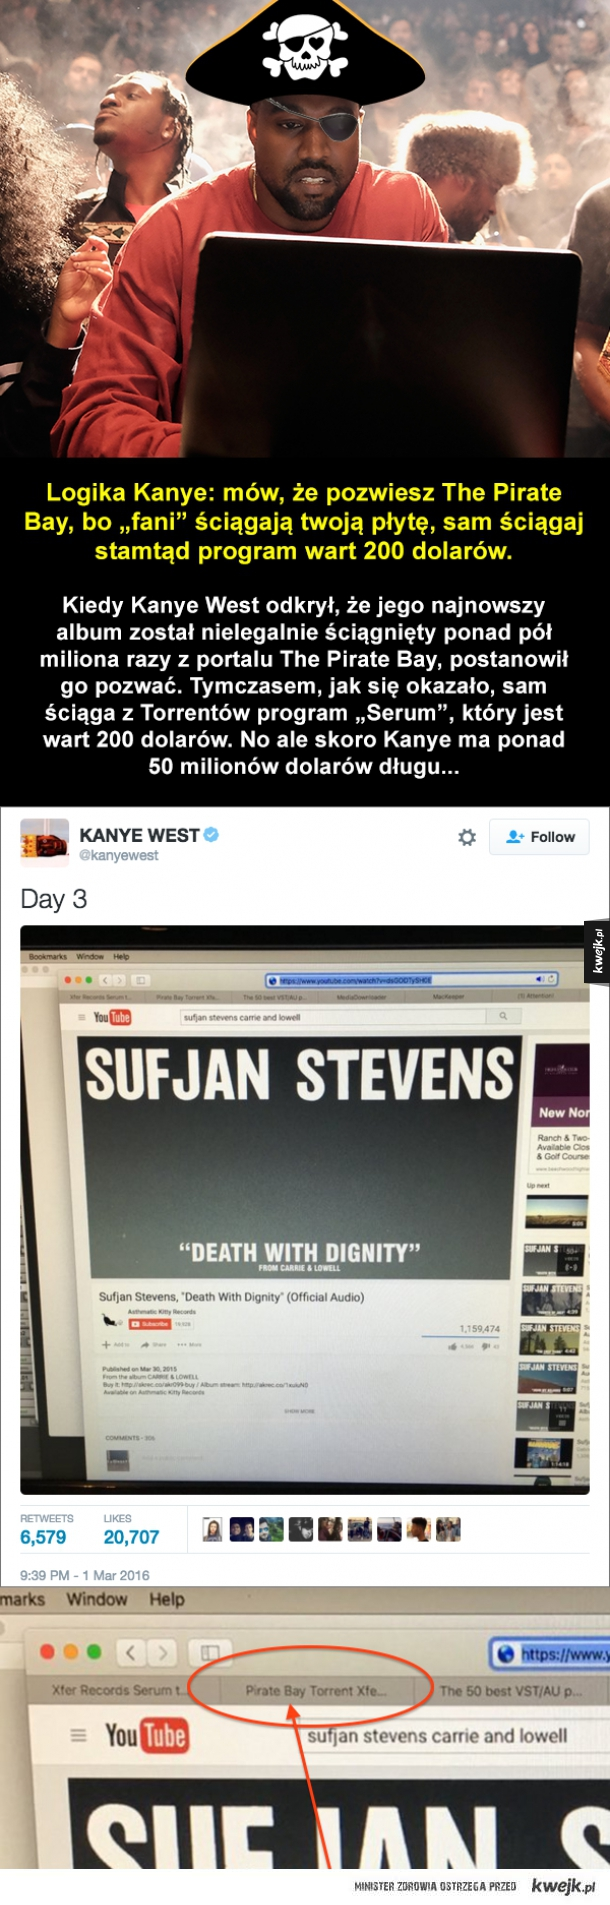 Brawa dla Kanye